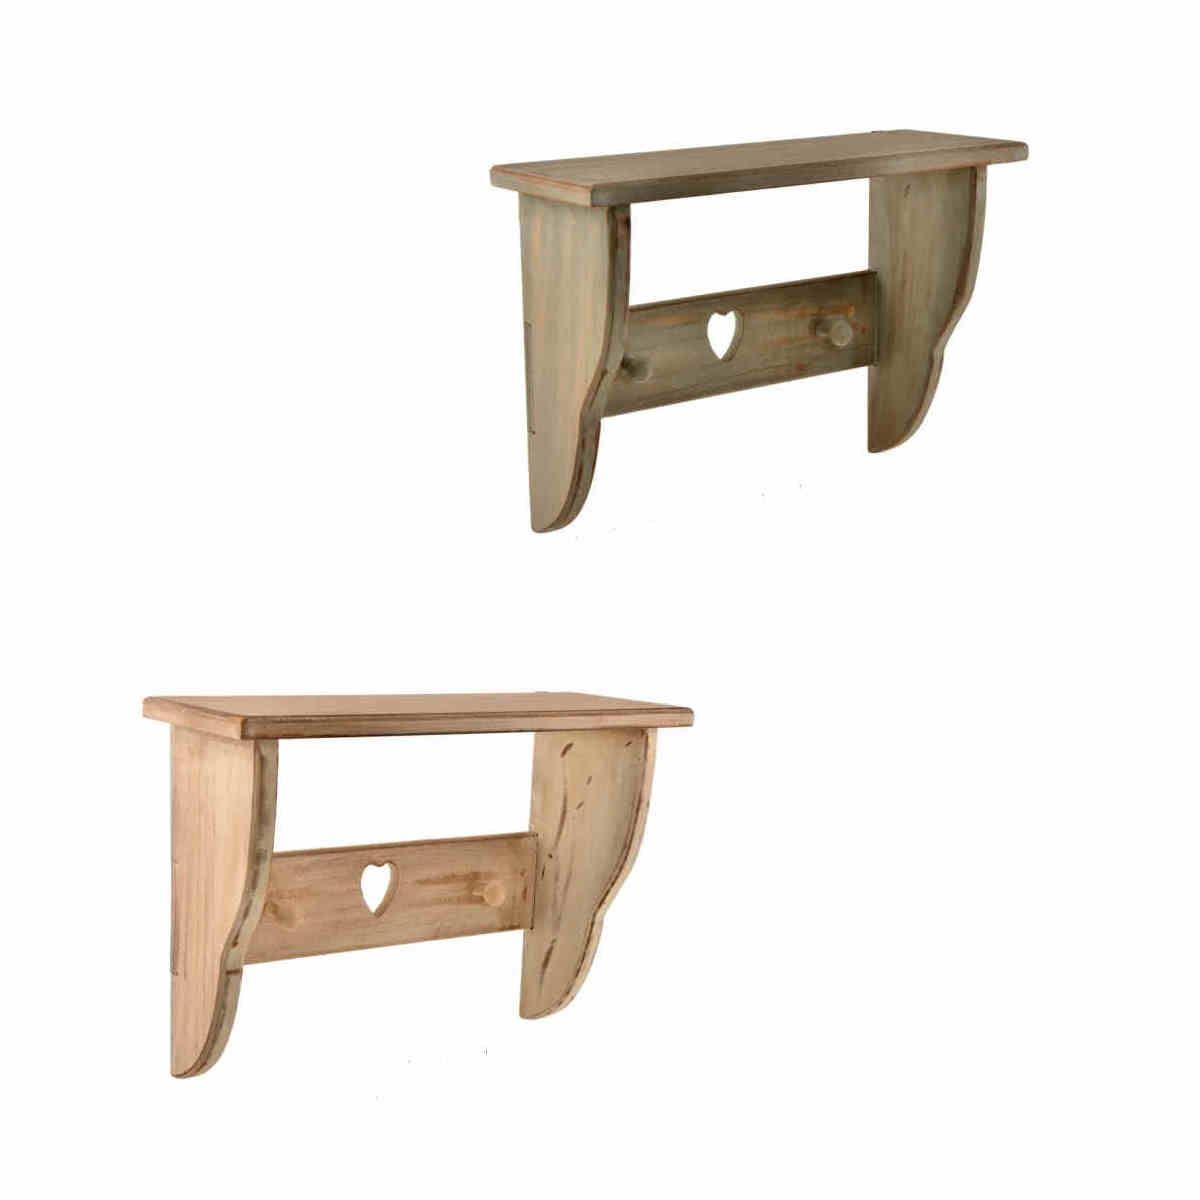 Wood Wall Shelving Units Decor Ideasdecor Ideas